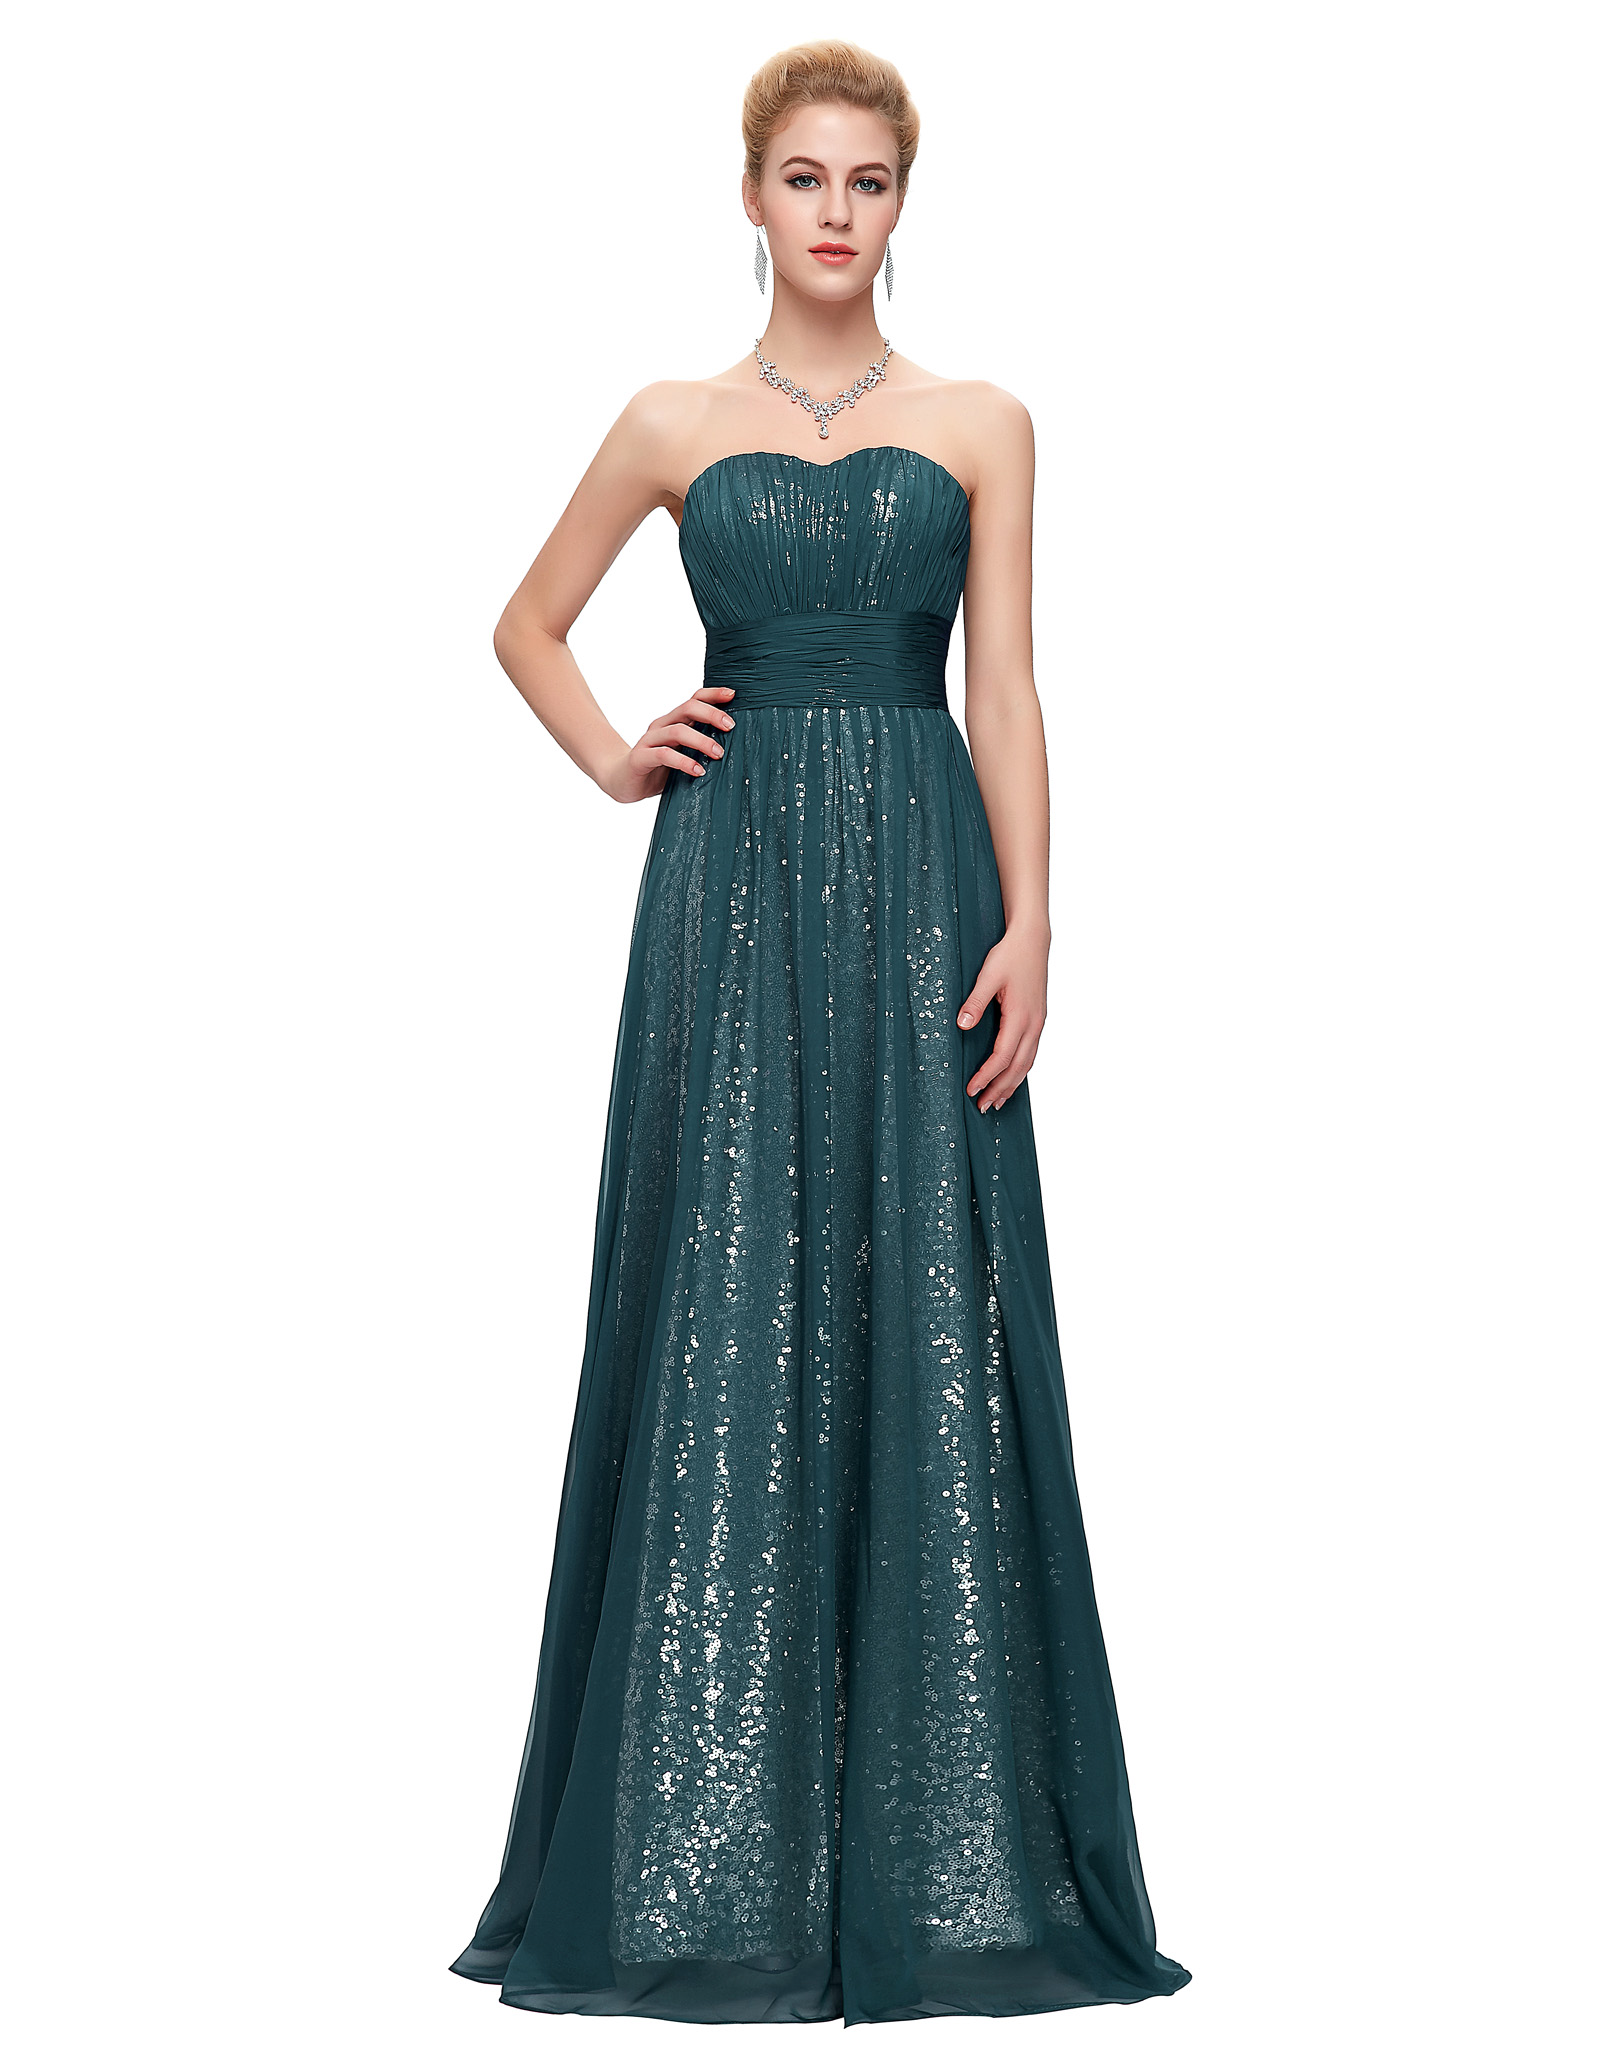 Asian formal dress